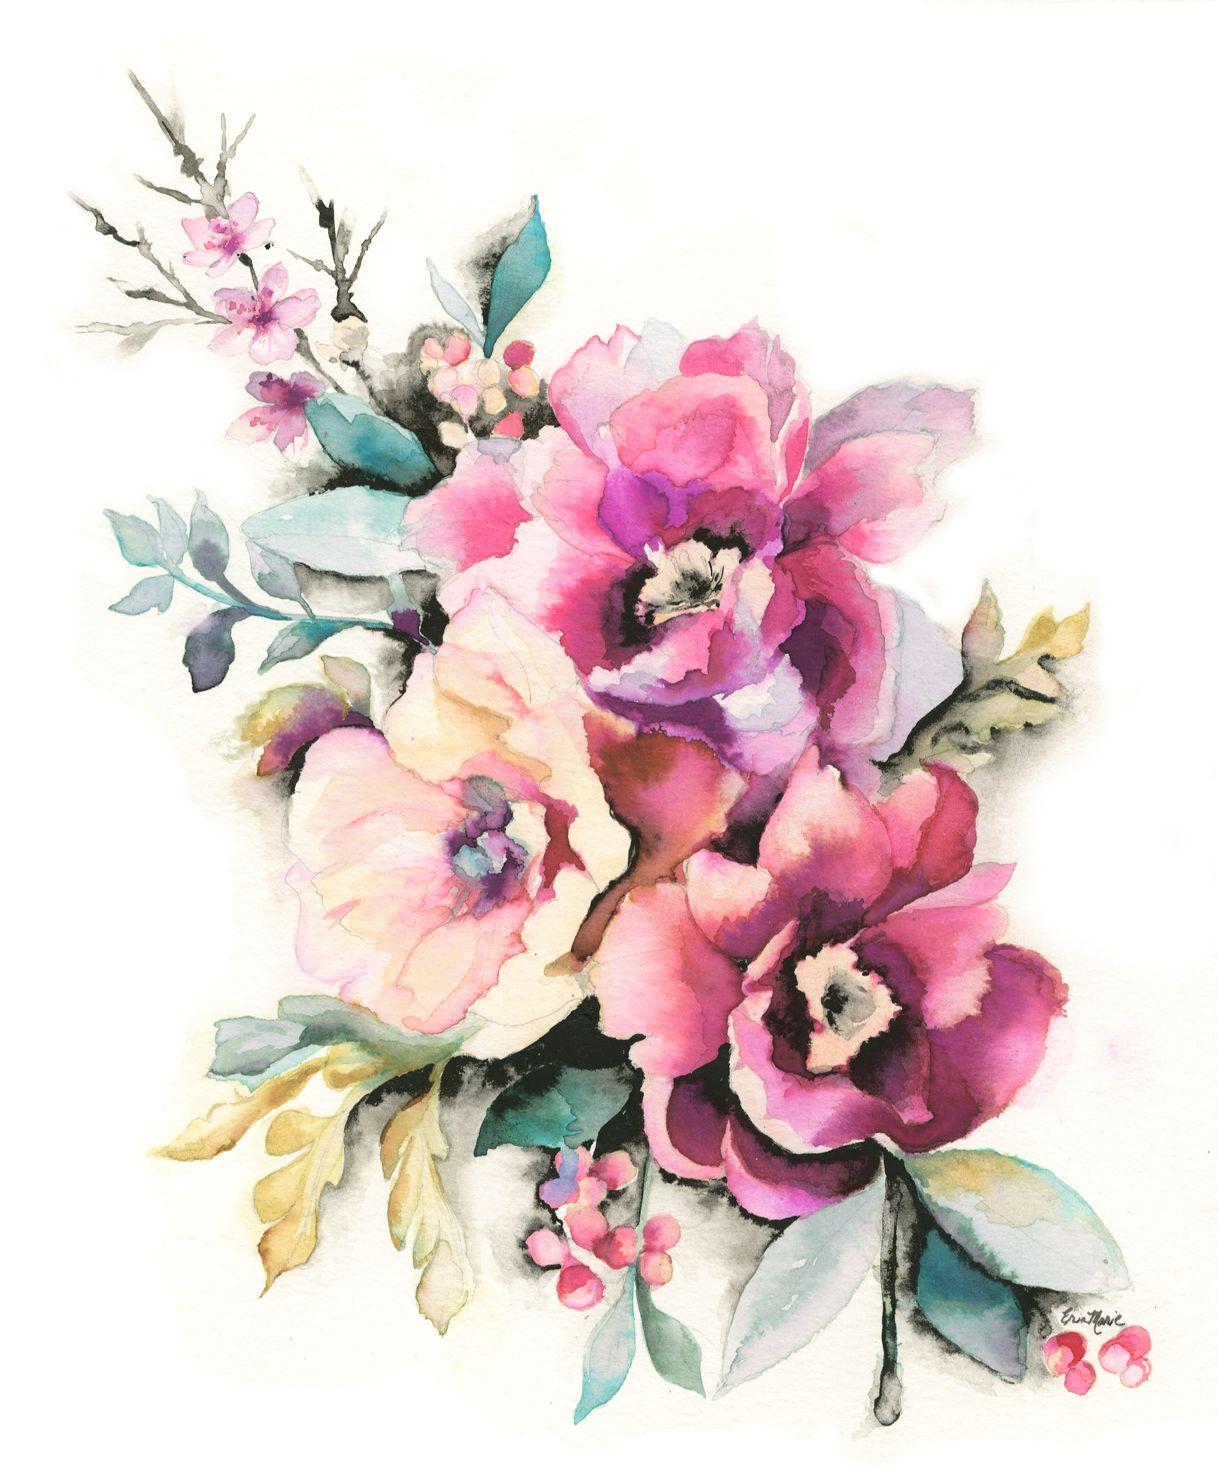 Illustrations Çiçek pinterest fashion illustrations and